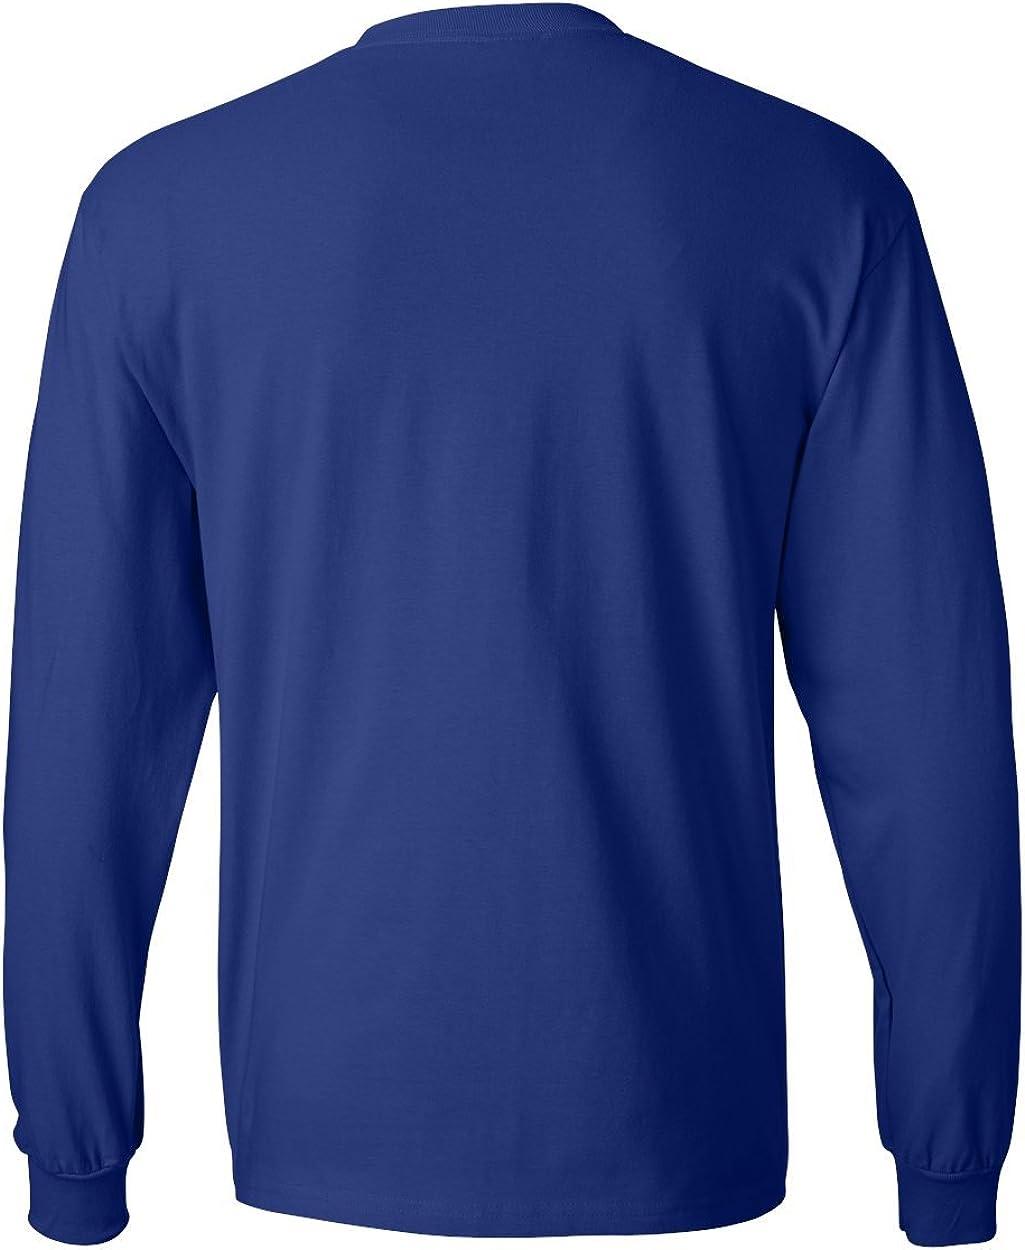 Hanes Men's Long-Sleeve Beefy-T Shirt (Pack of 2) 1 Black / 1 Royal